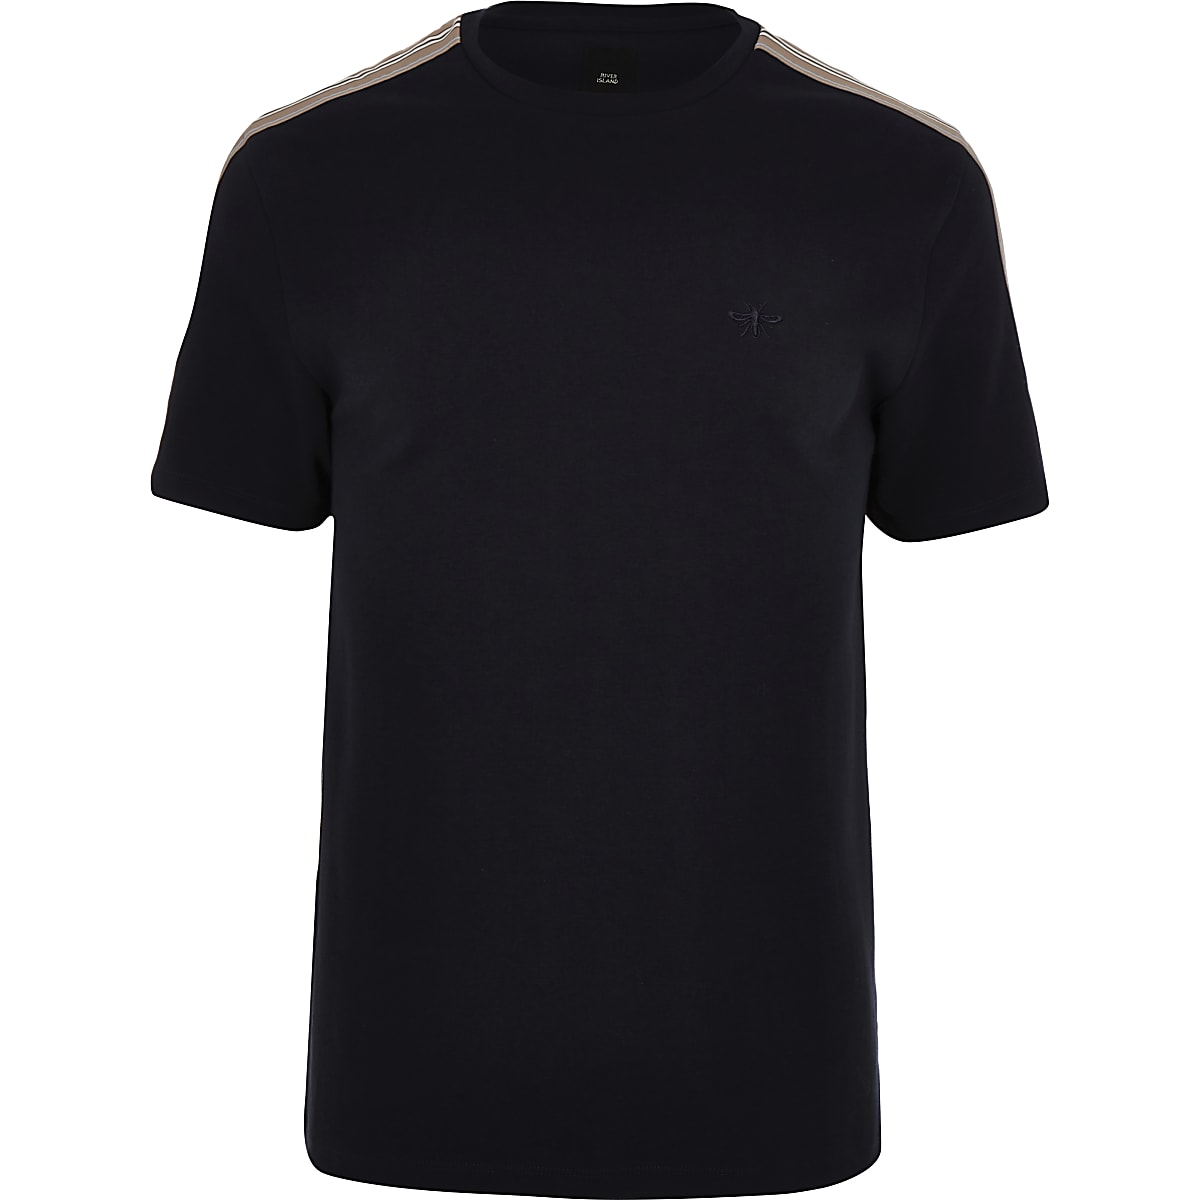 Big and Tall - Marineblauw T-shirt met bies en ronde hals